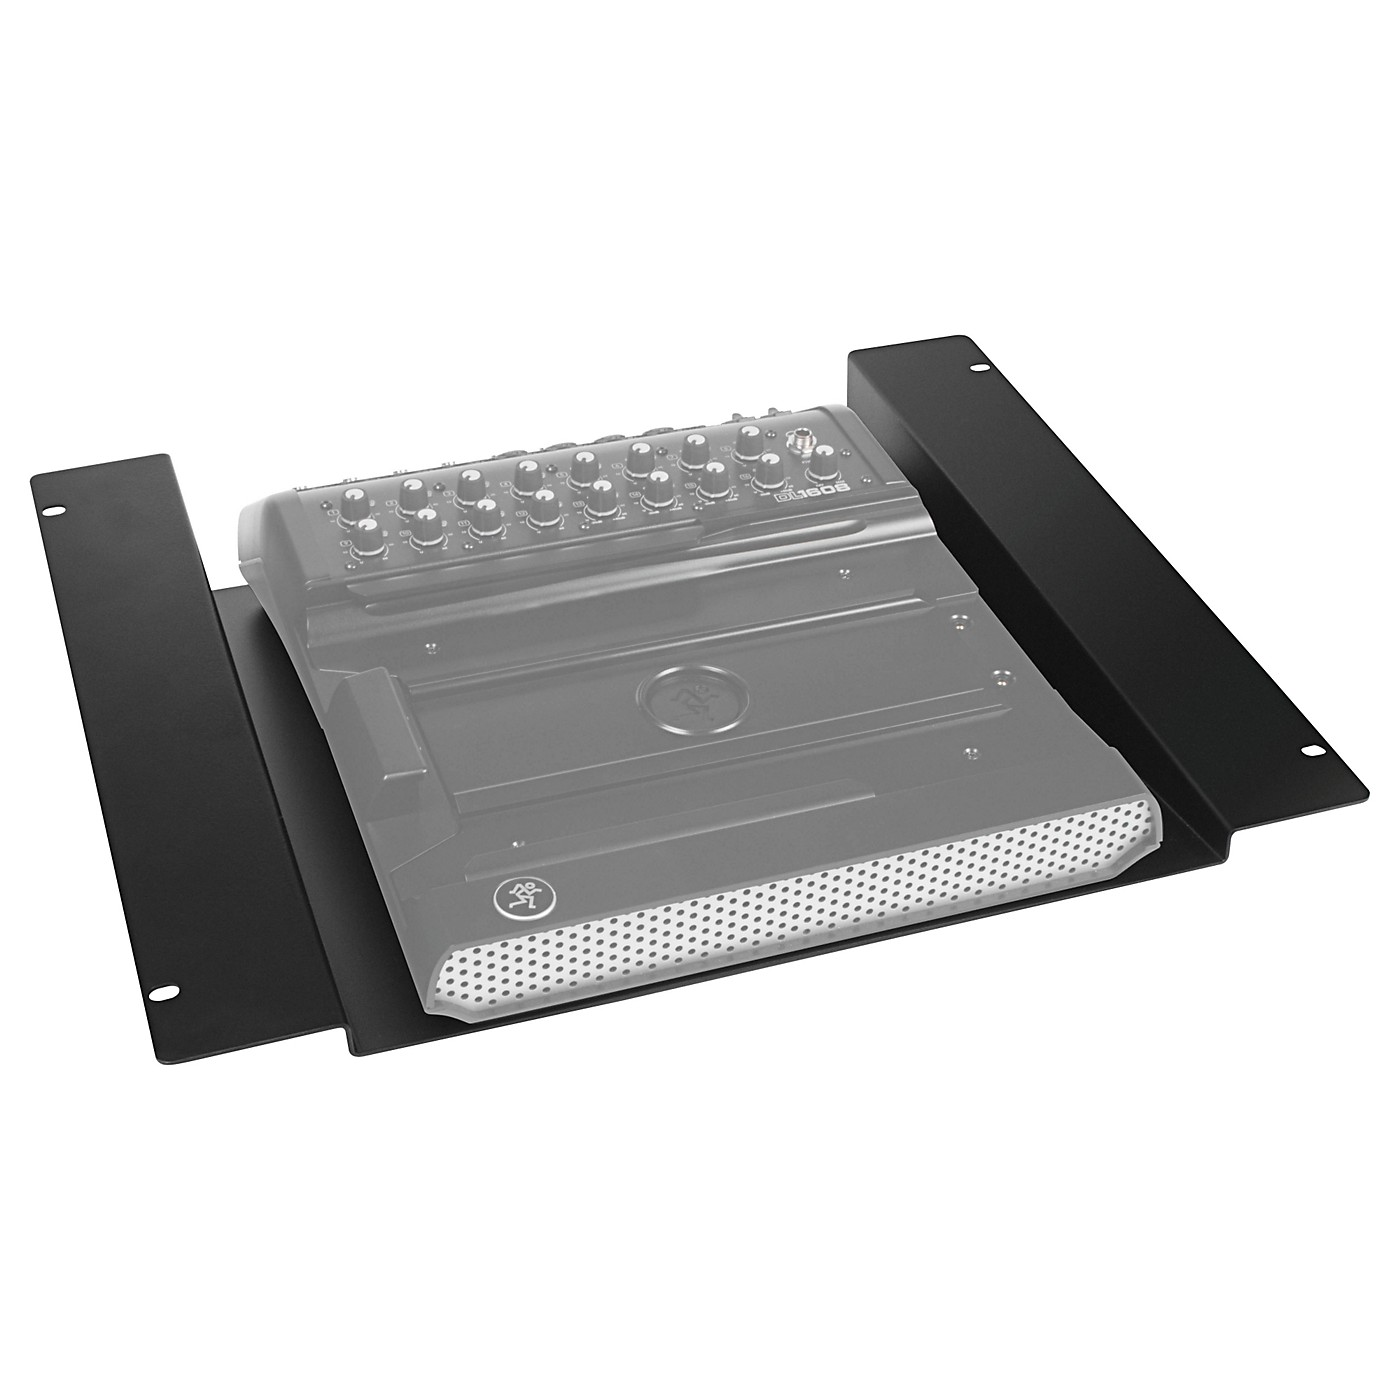 Mackie Rackmount Bracket for Mackie DL1608 iPad Mixer thumbnail